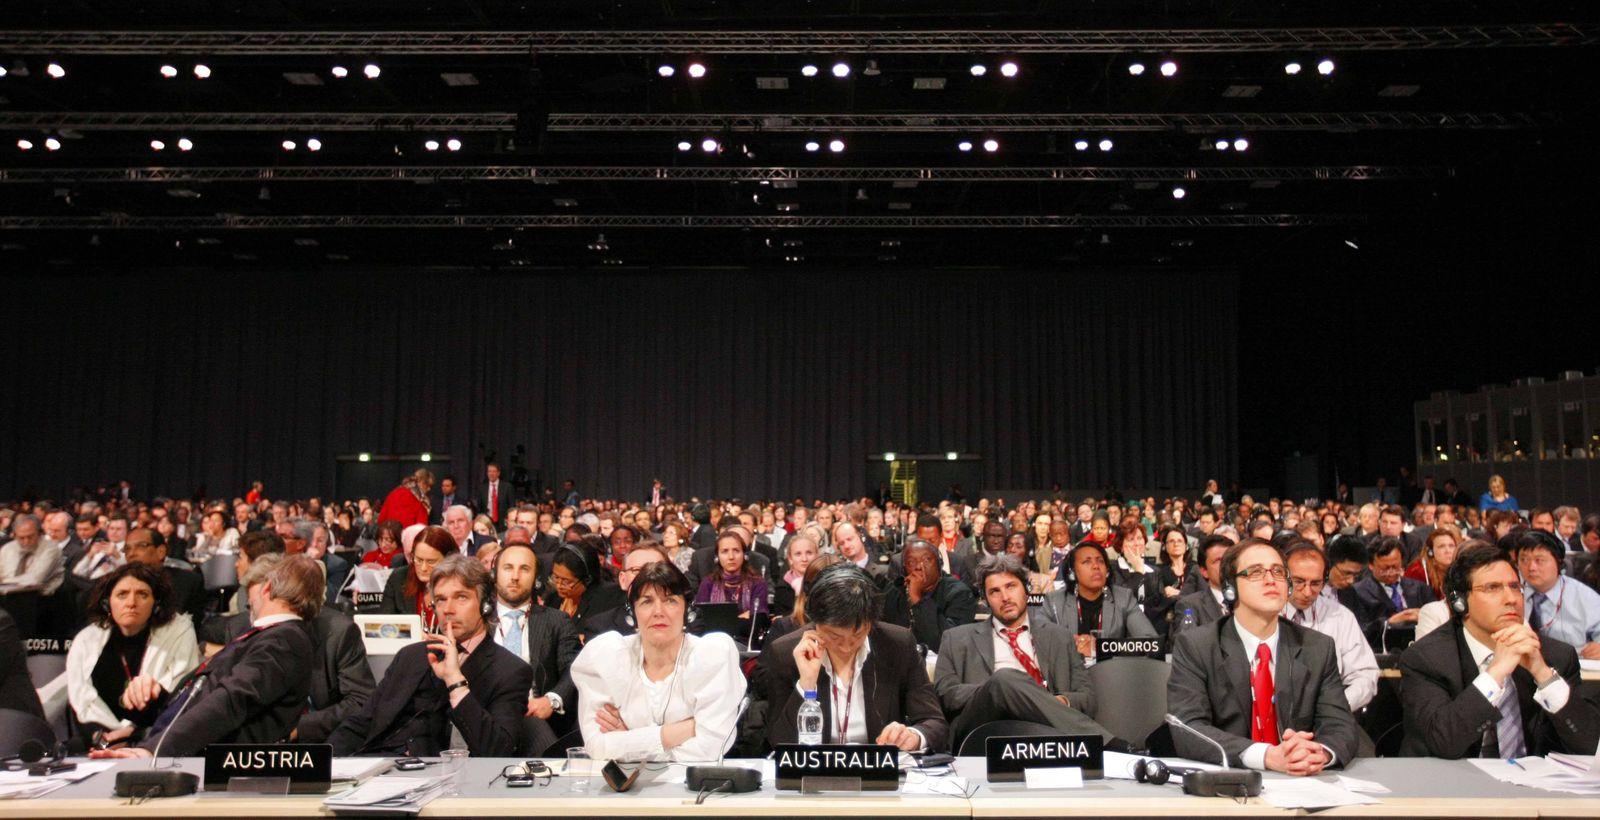 2009 Klimagipfel Kopenhagen